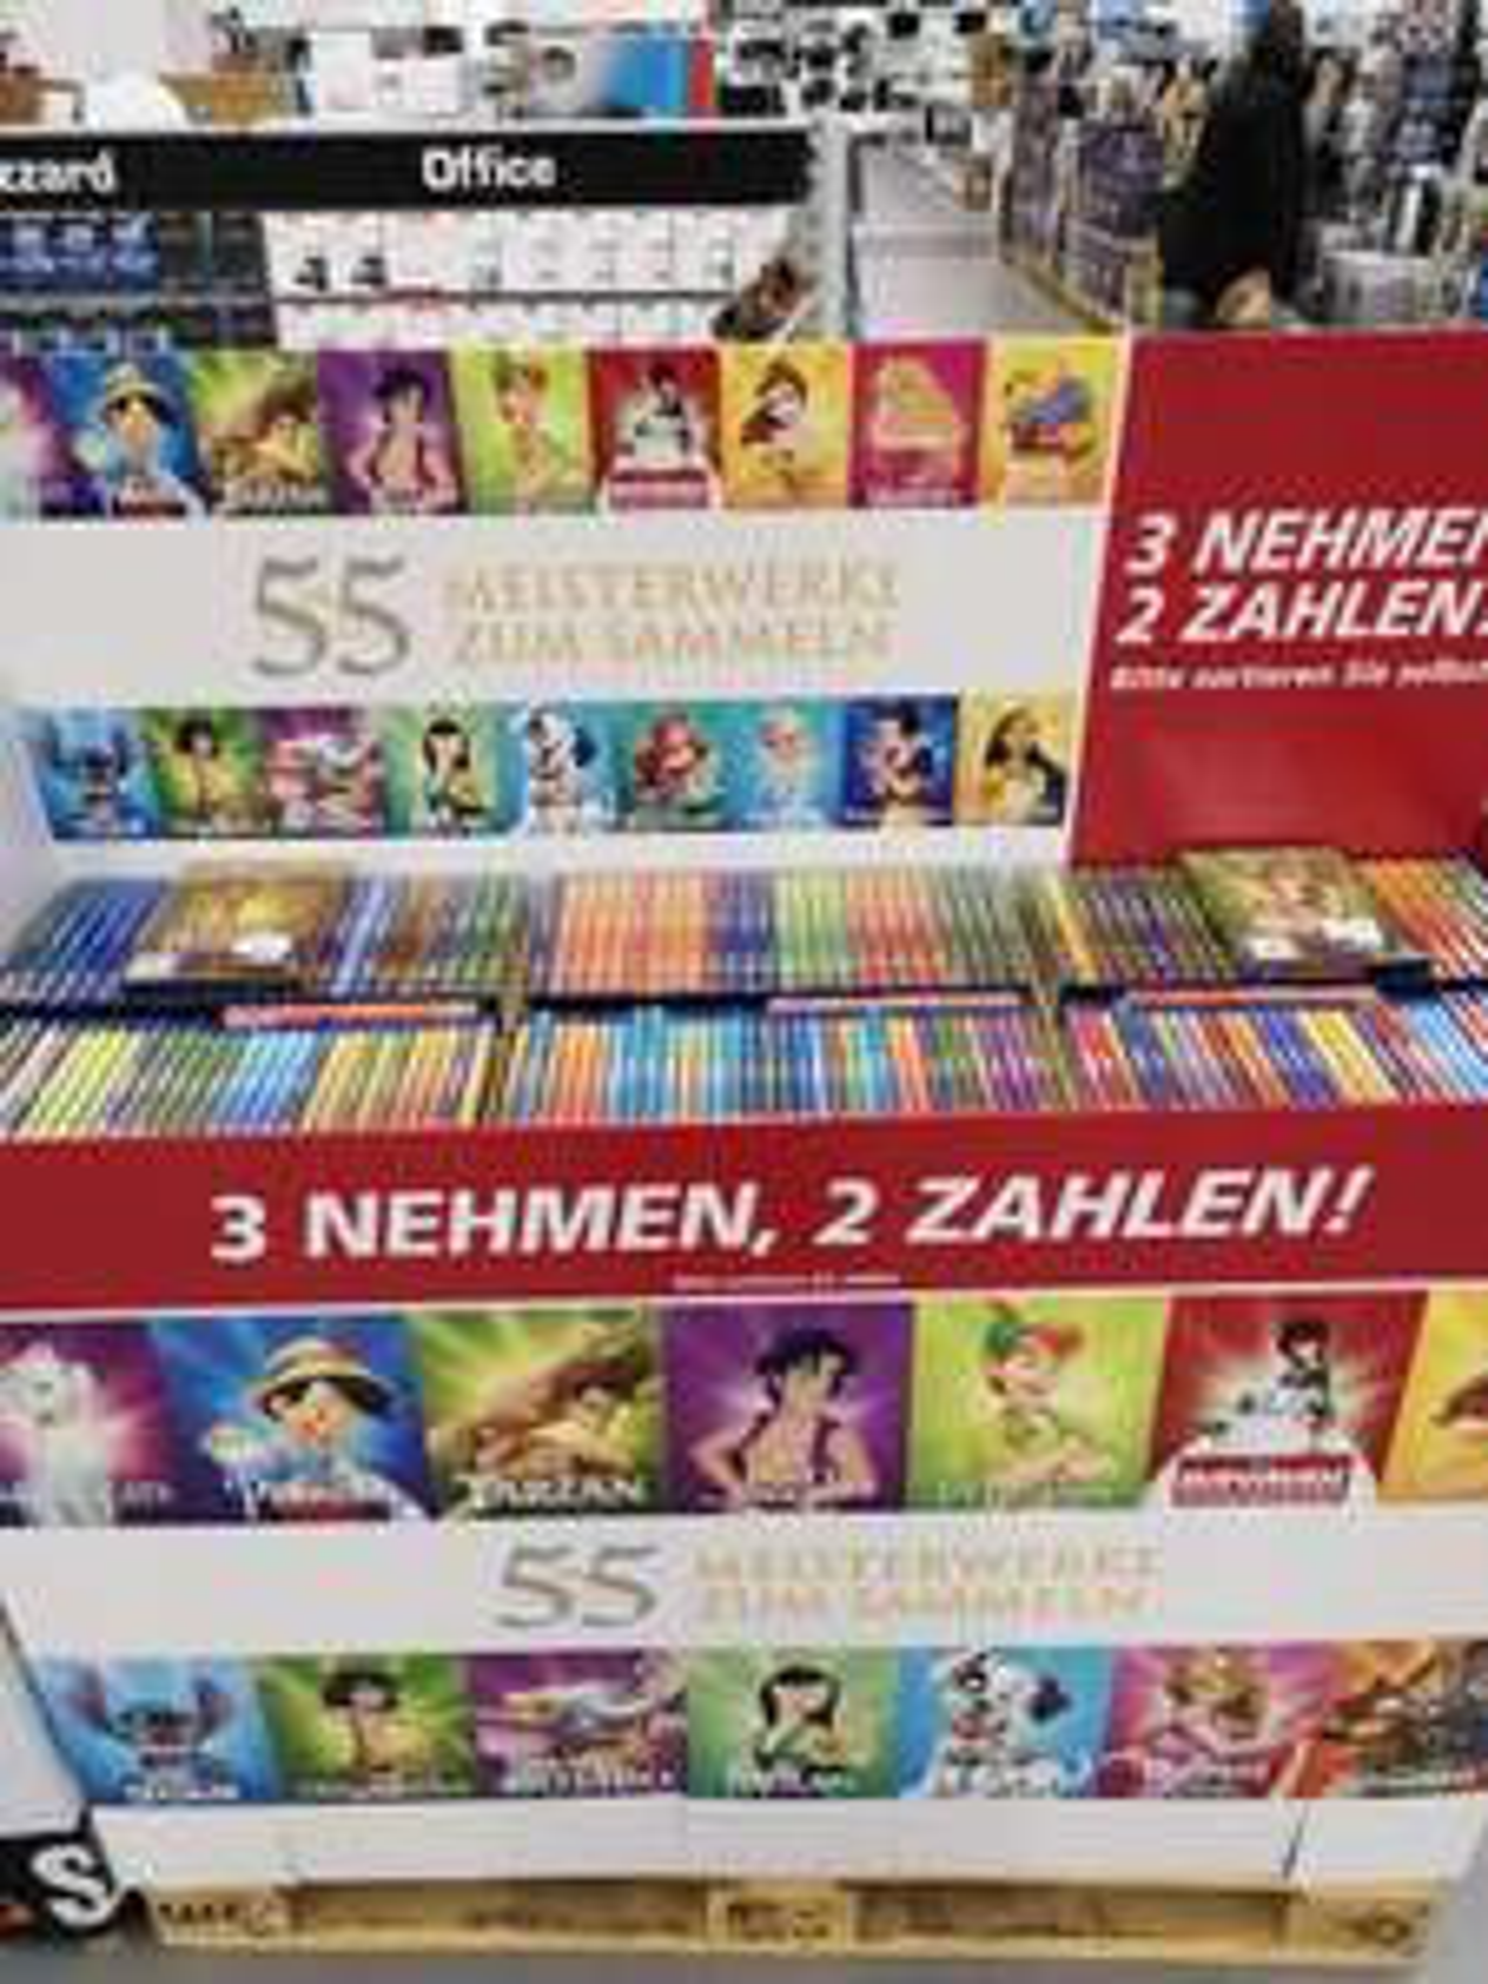 Nimm 3 Zahl 2 Disney classics Saturn Braunschweig